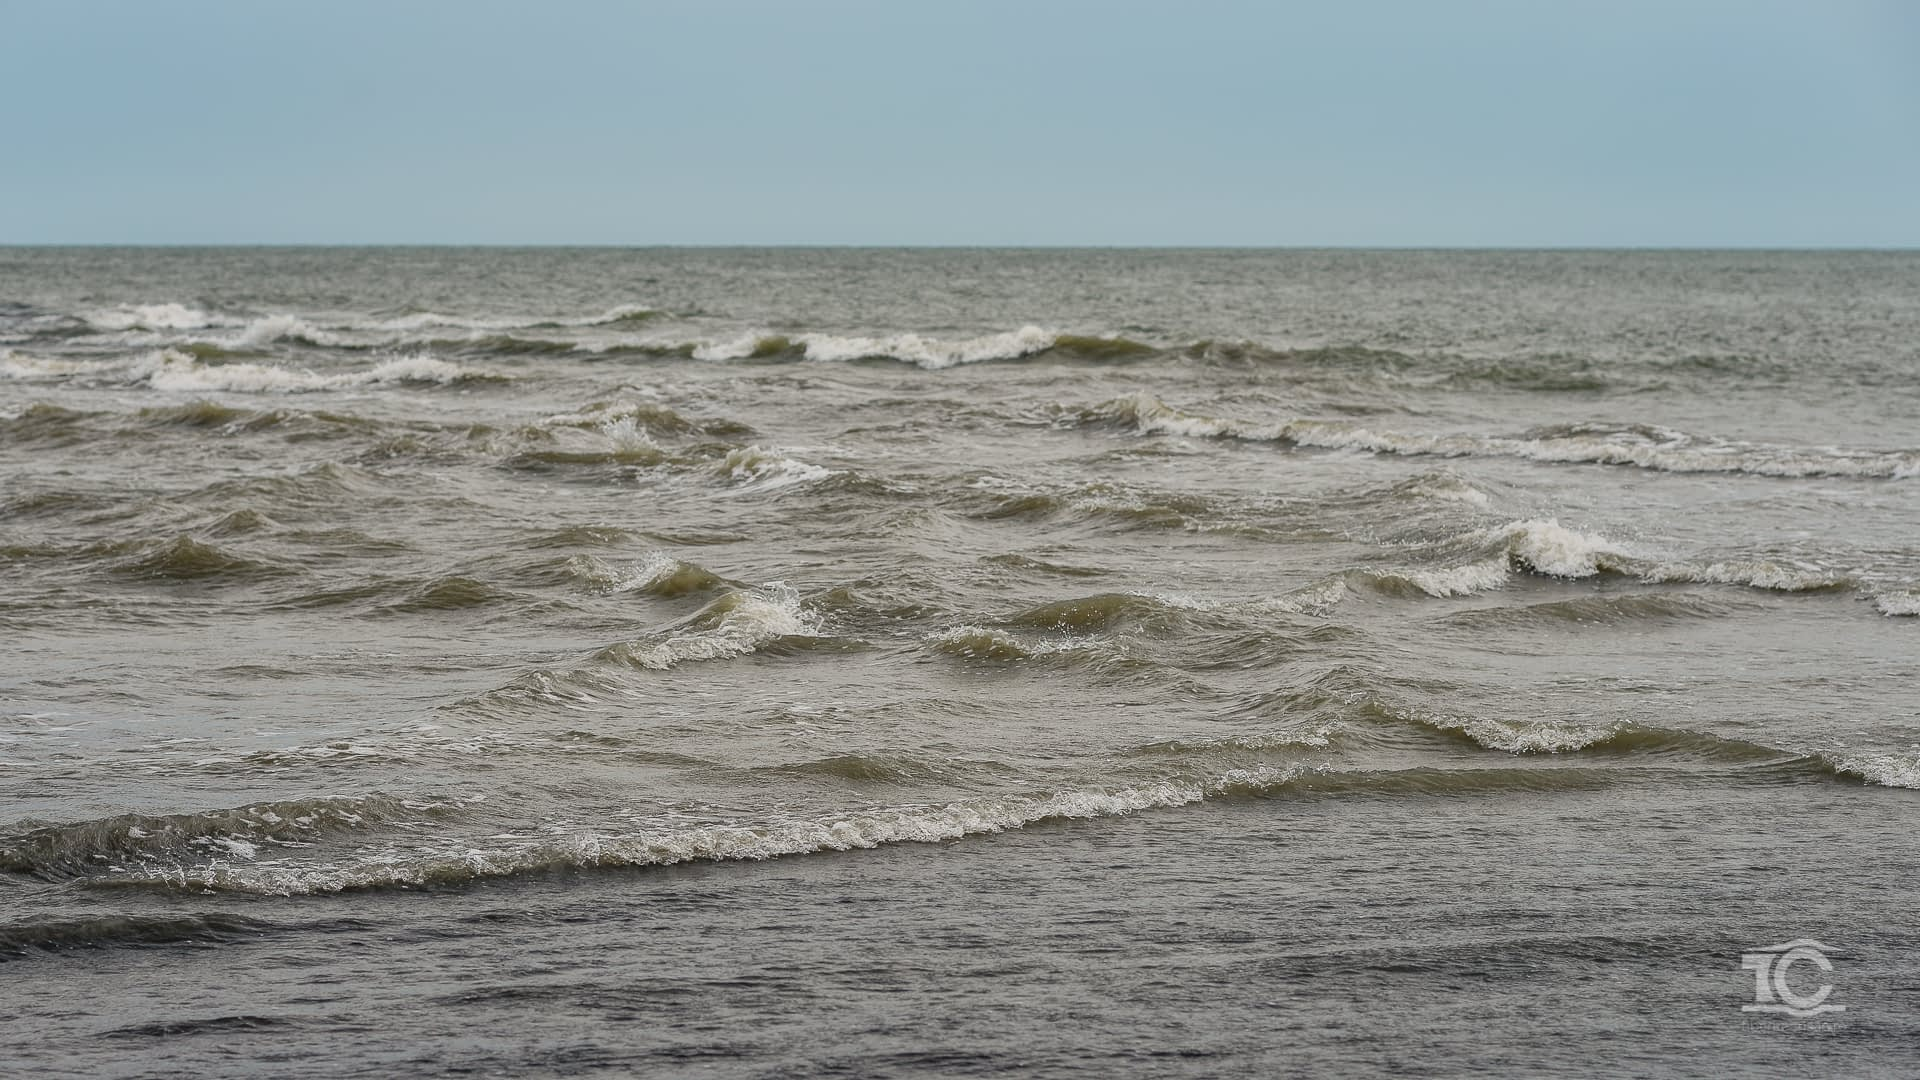 Locul unde Dunarea se varsa in Marea Neagra, bratul Sf. Gheorghe